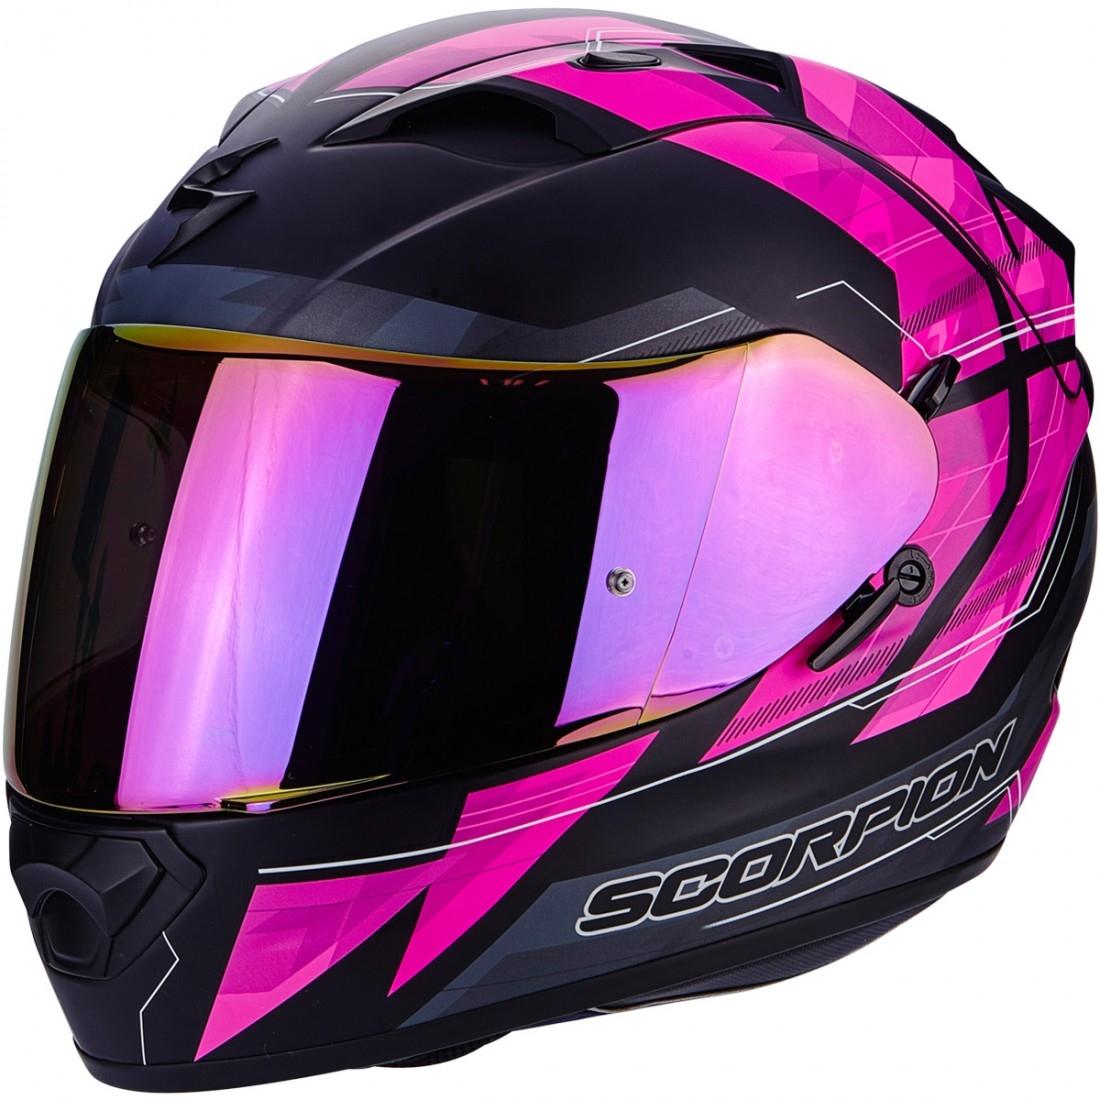 casco scorpion exo 1200 air hornet matt pink motocard. Black Bedroom Furniture Sets. Home Design Ideas